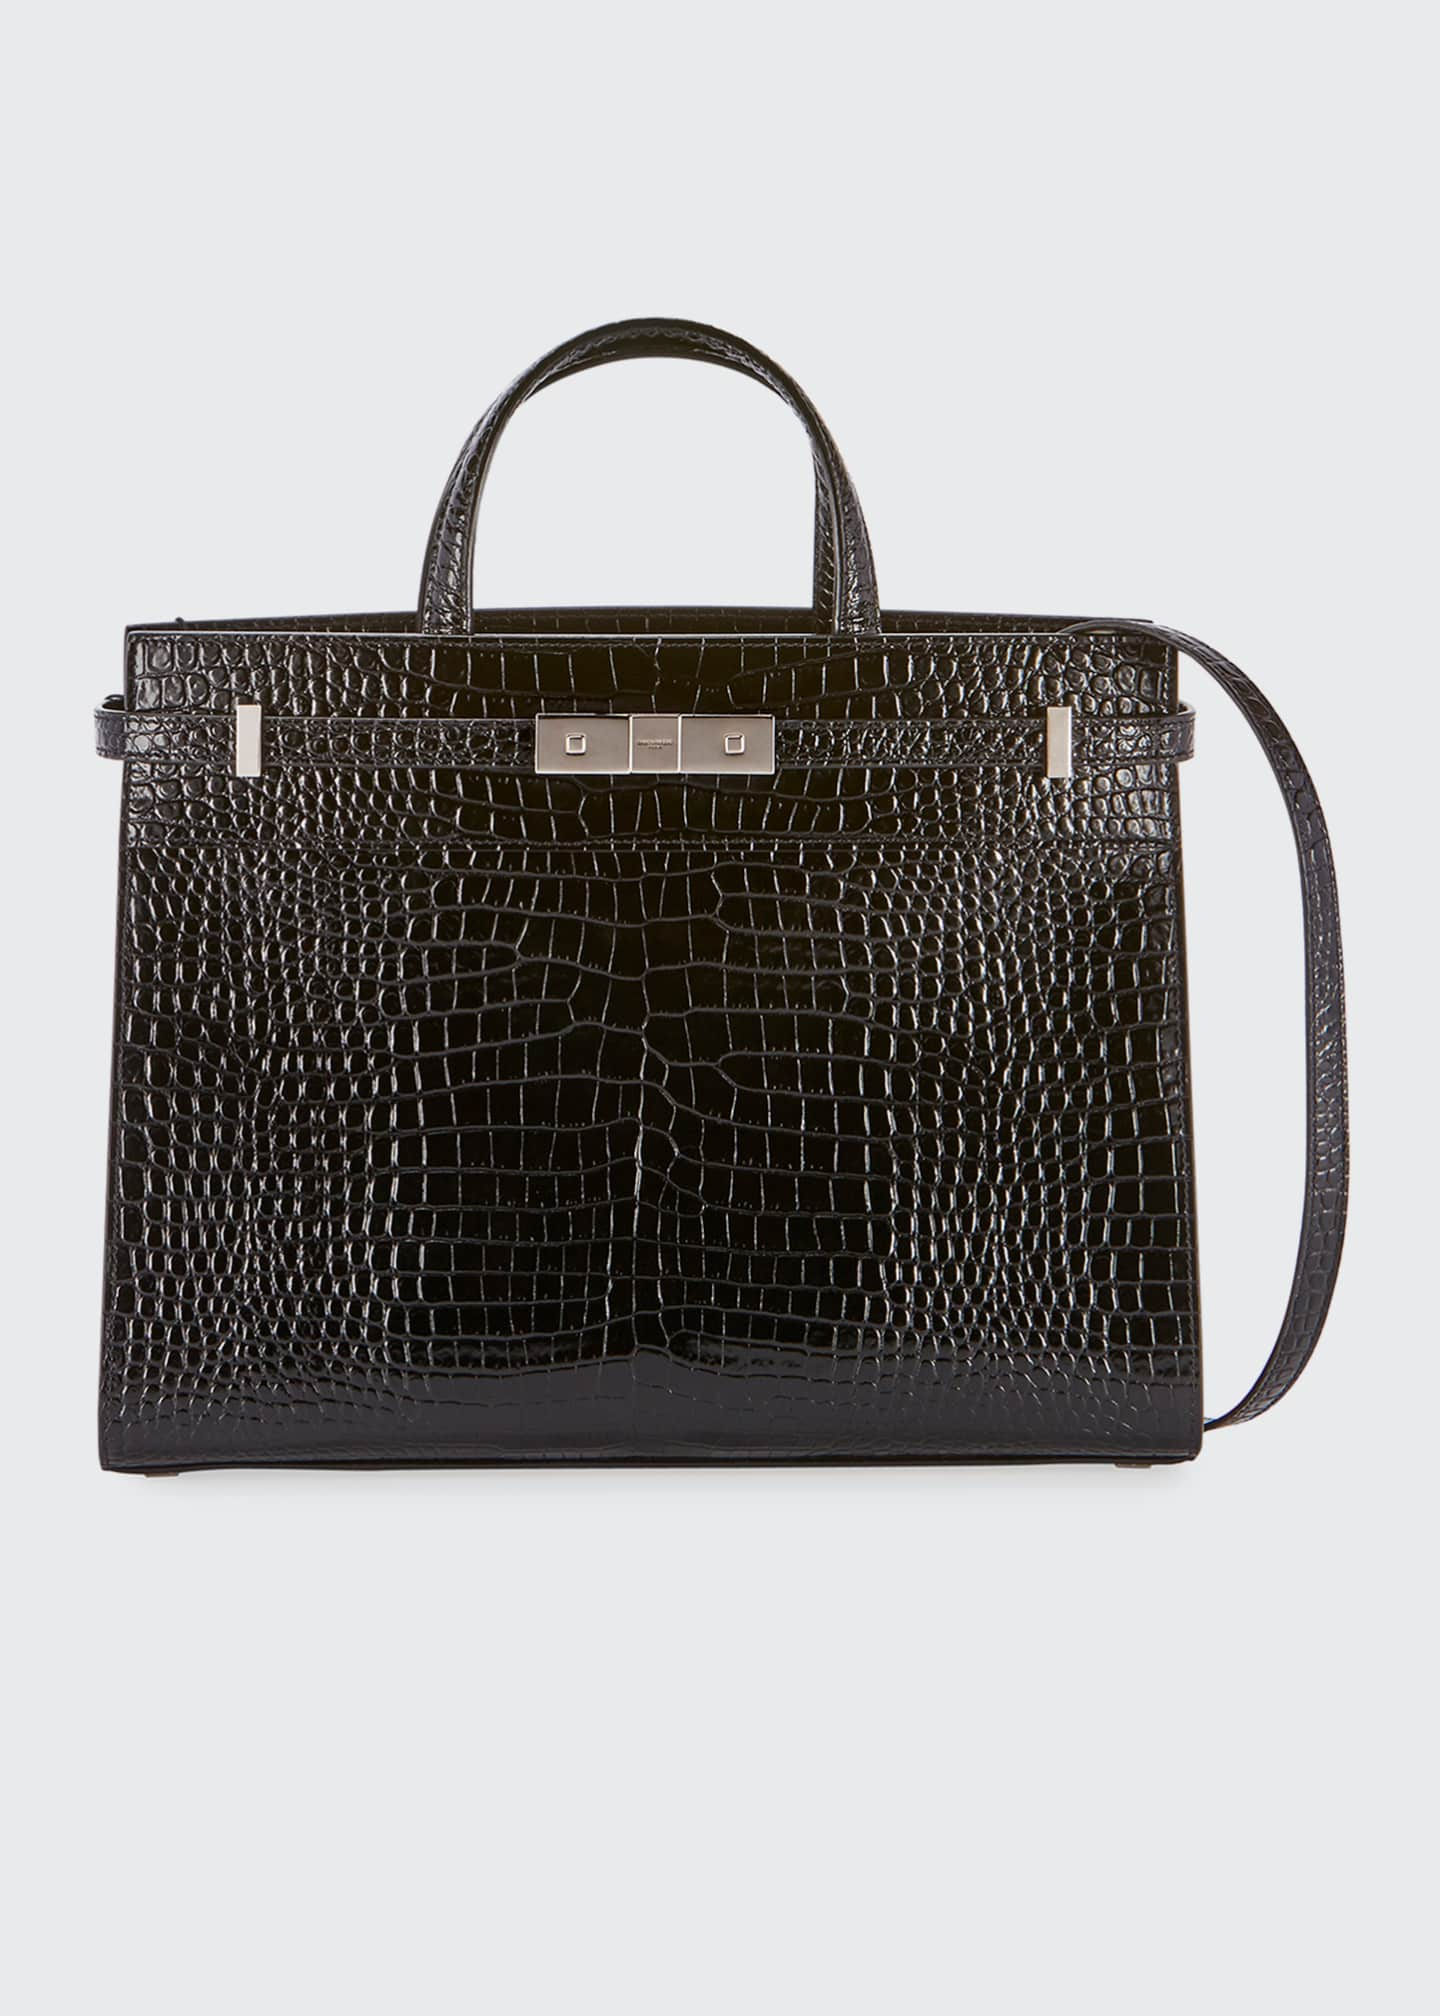 Saint Laurent Manhattan Small Crocodile-Embossed Tote Bag